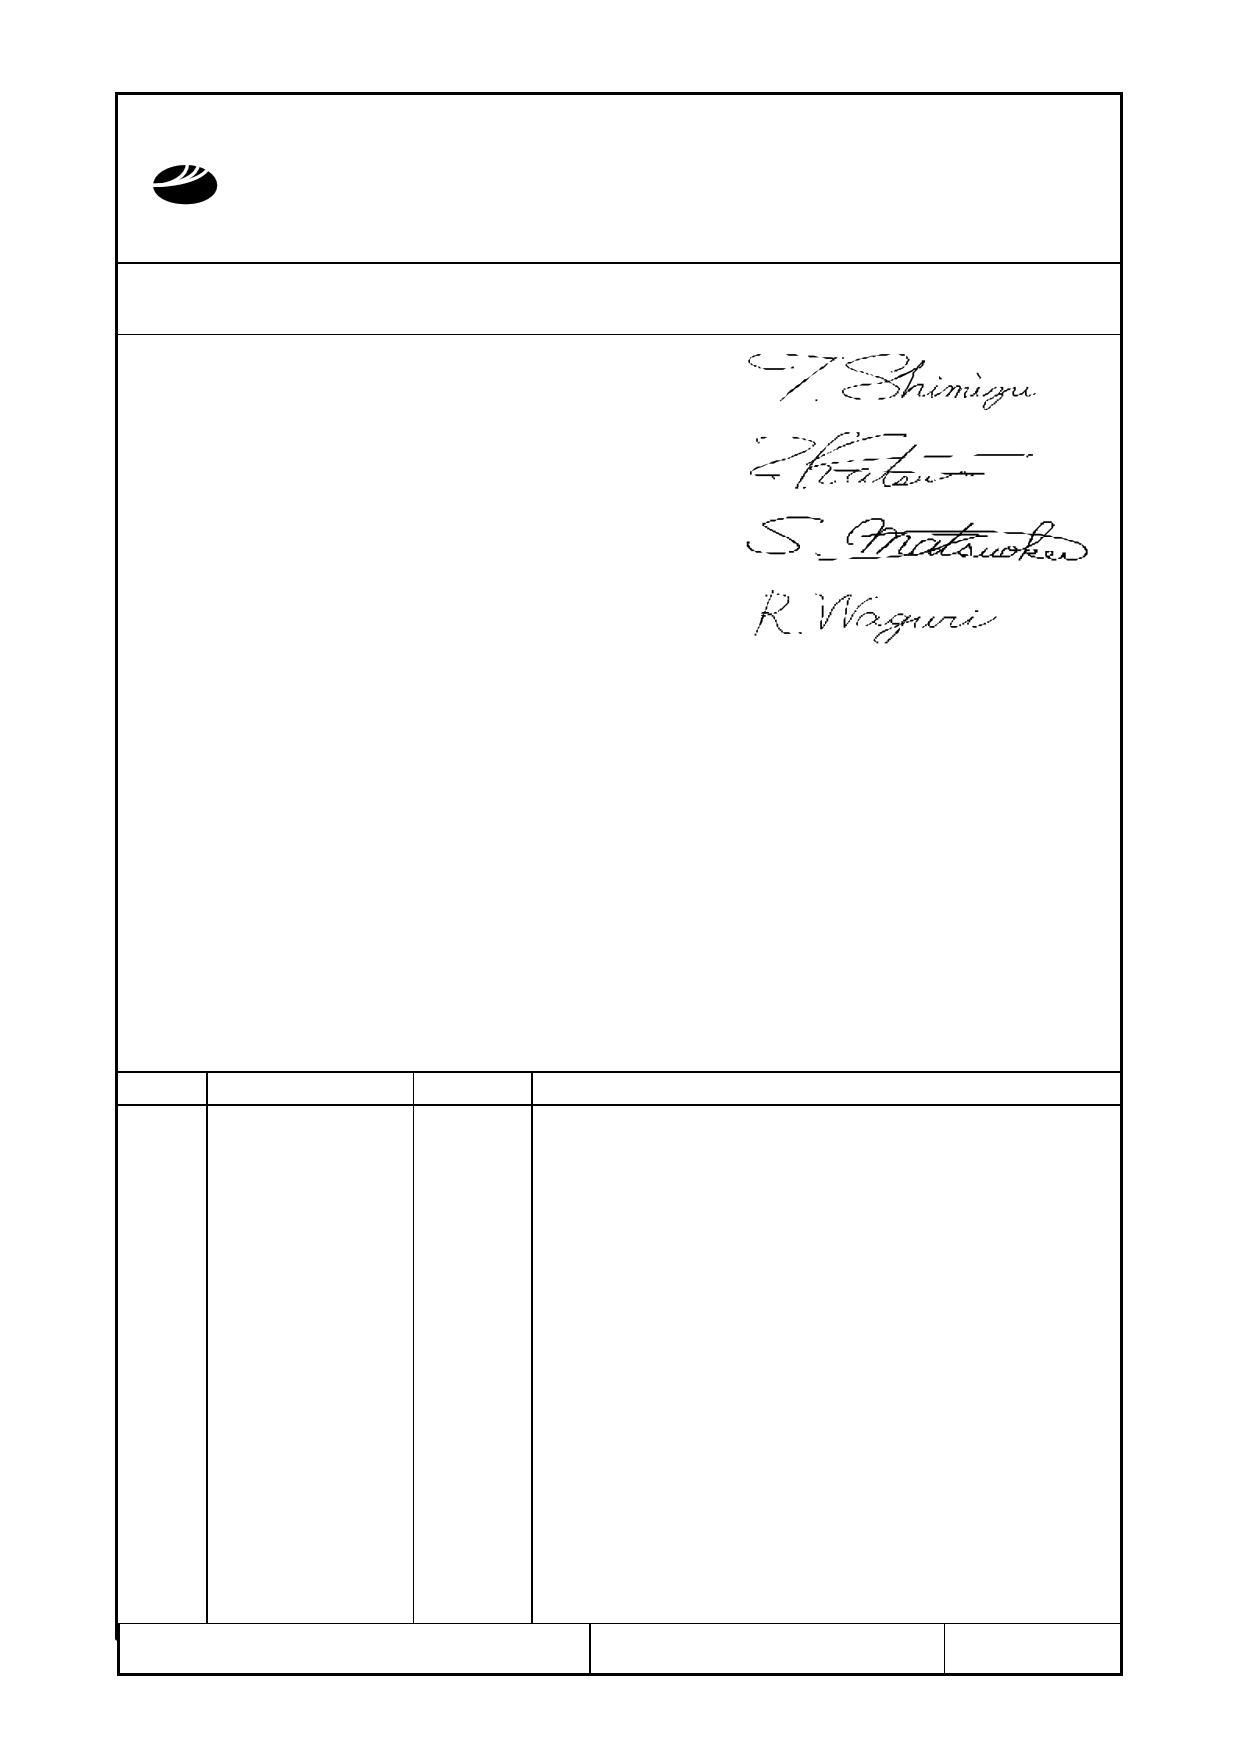 C-51505NFQJ-LB-AE datasheet